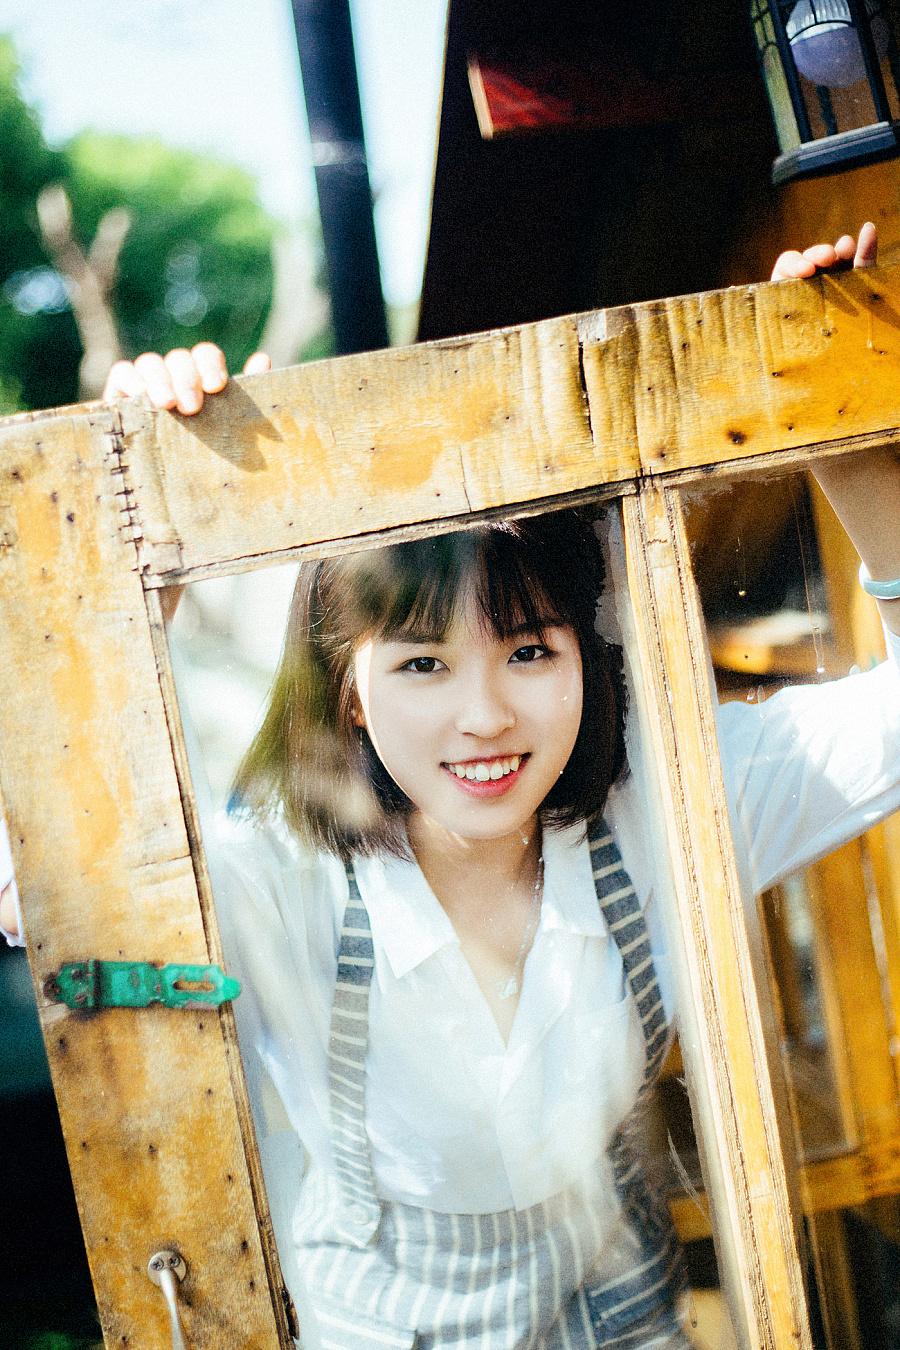 Tiger tooth girl—人像摄影